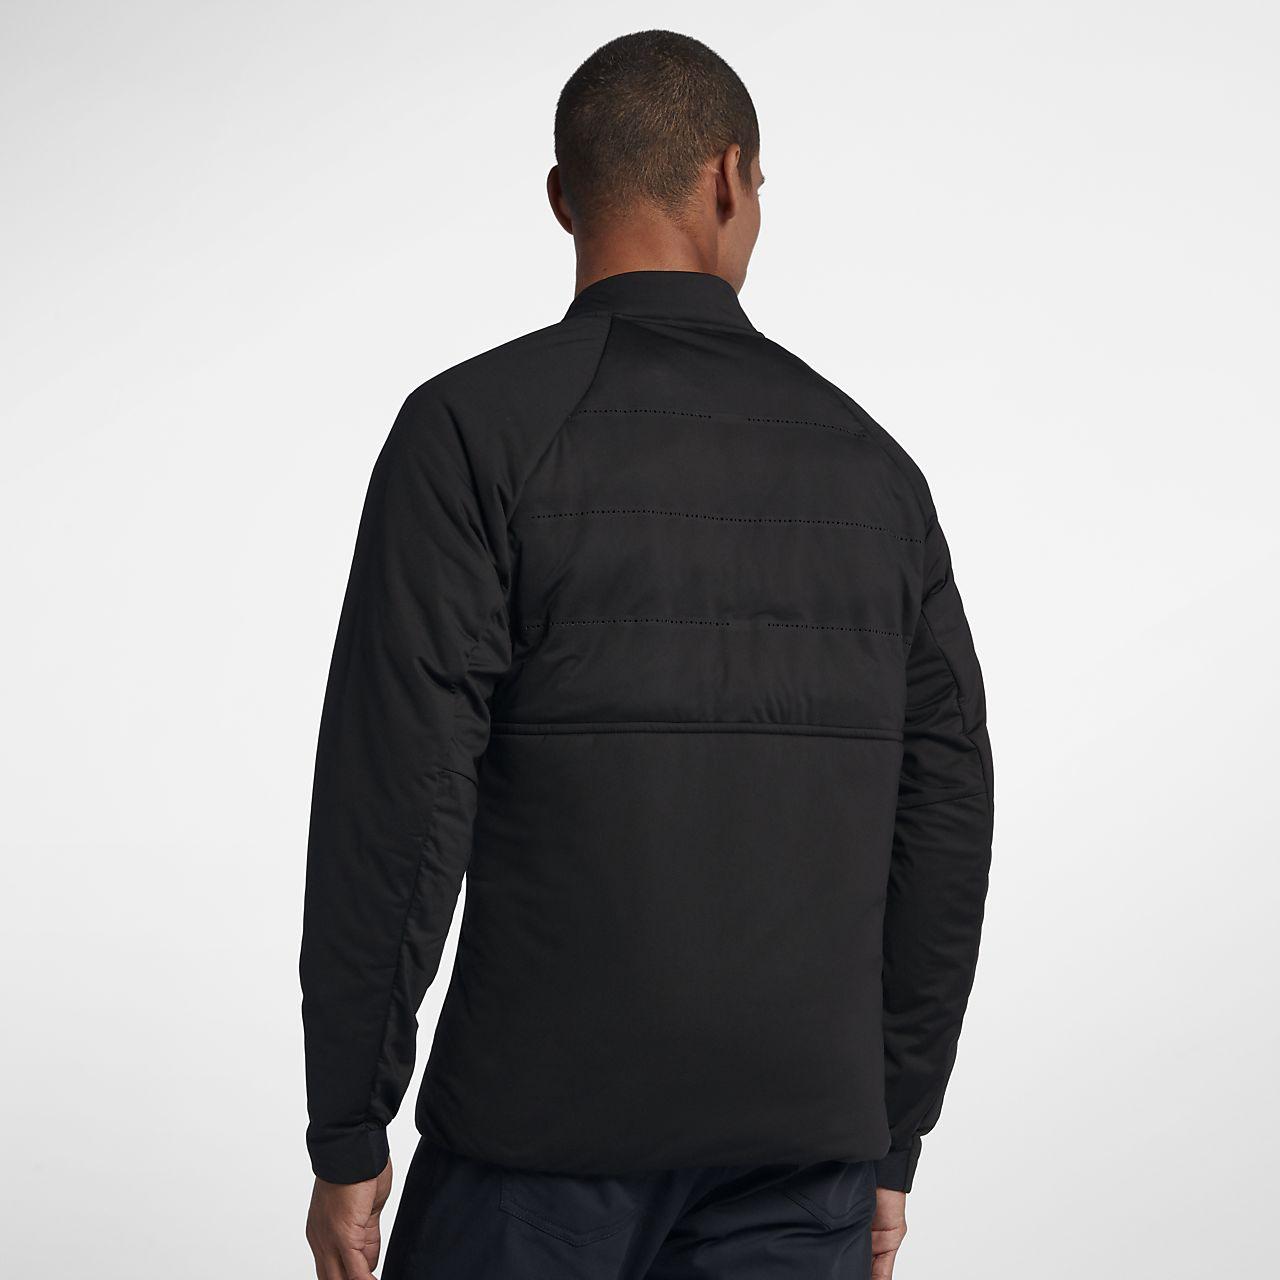 finest selection 7a515 c93e1 ... Nike AeroLoft Men s Golf Jacket